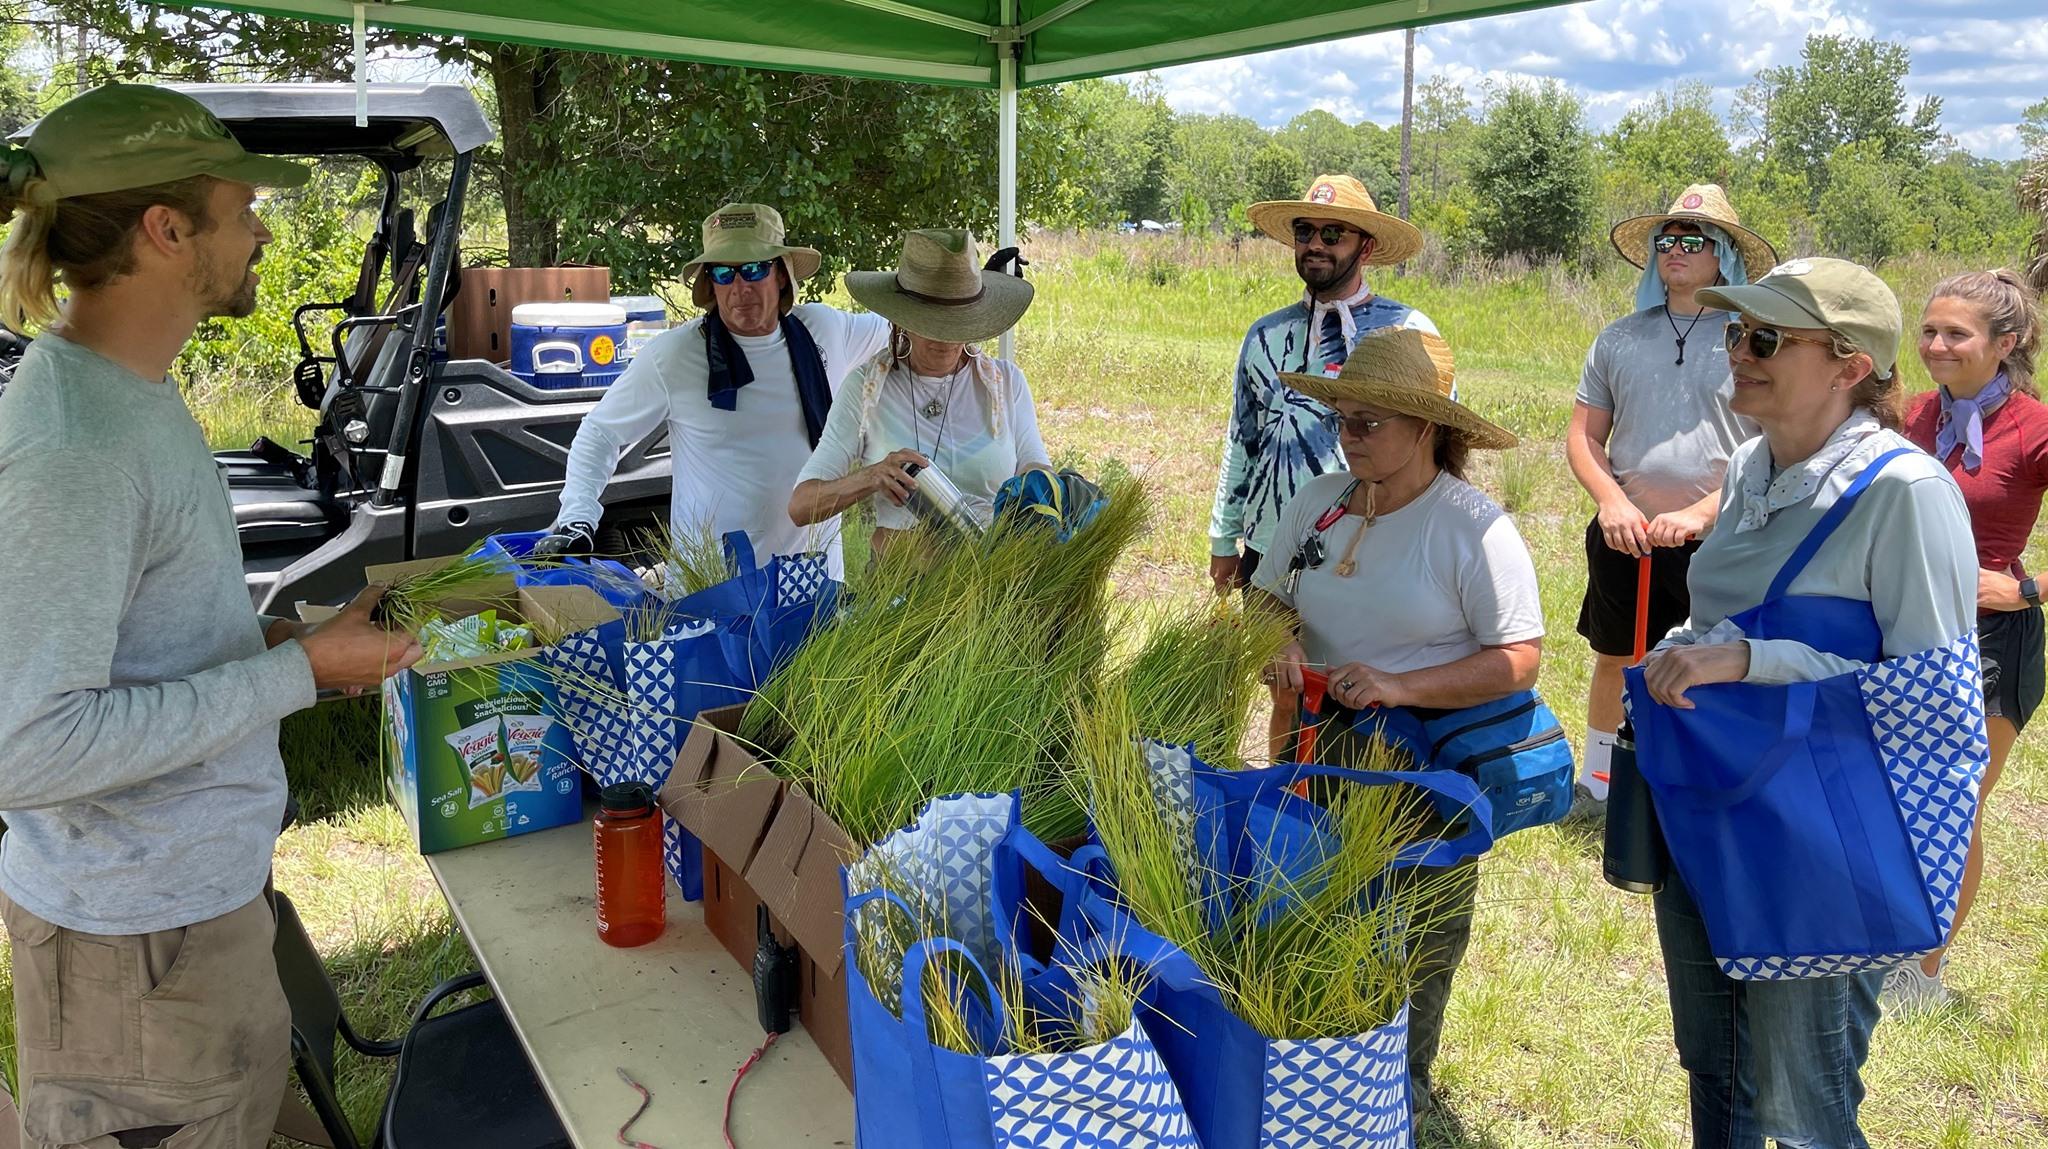 A Sustany Foundation outdoor program activity